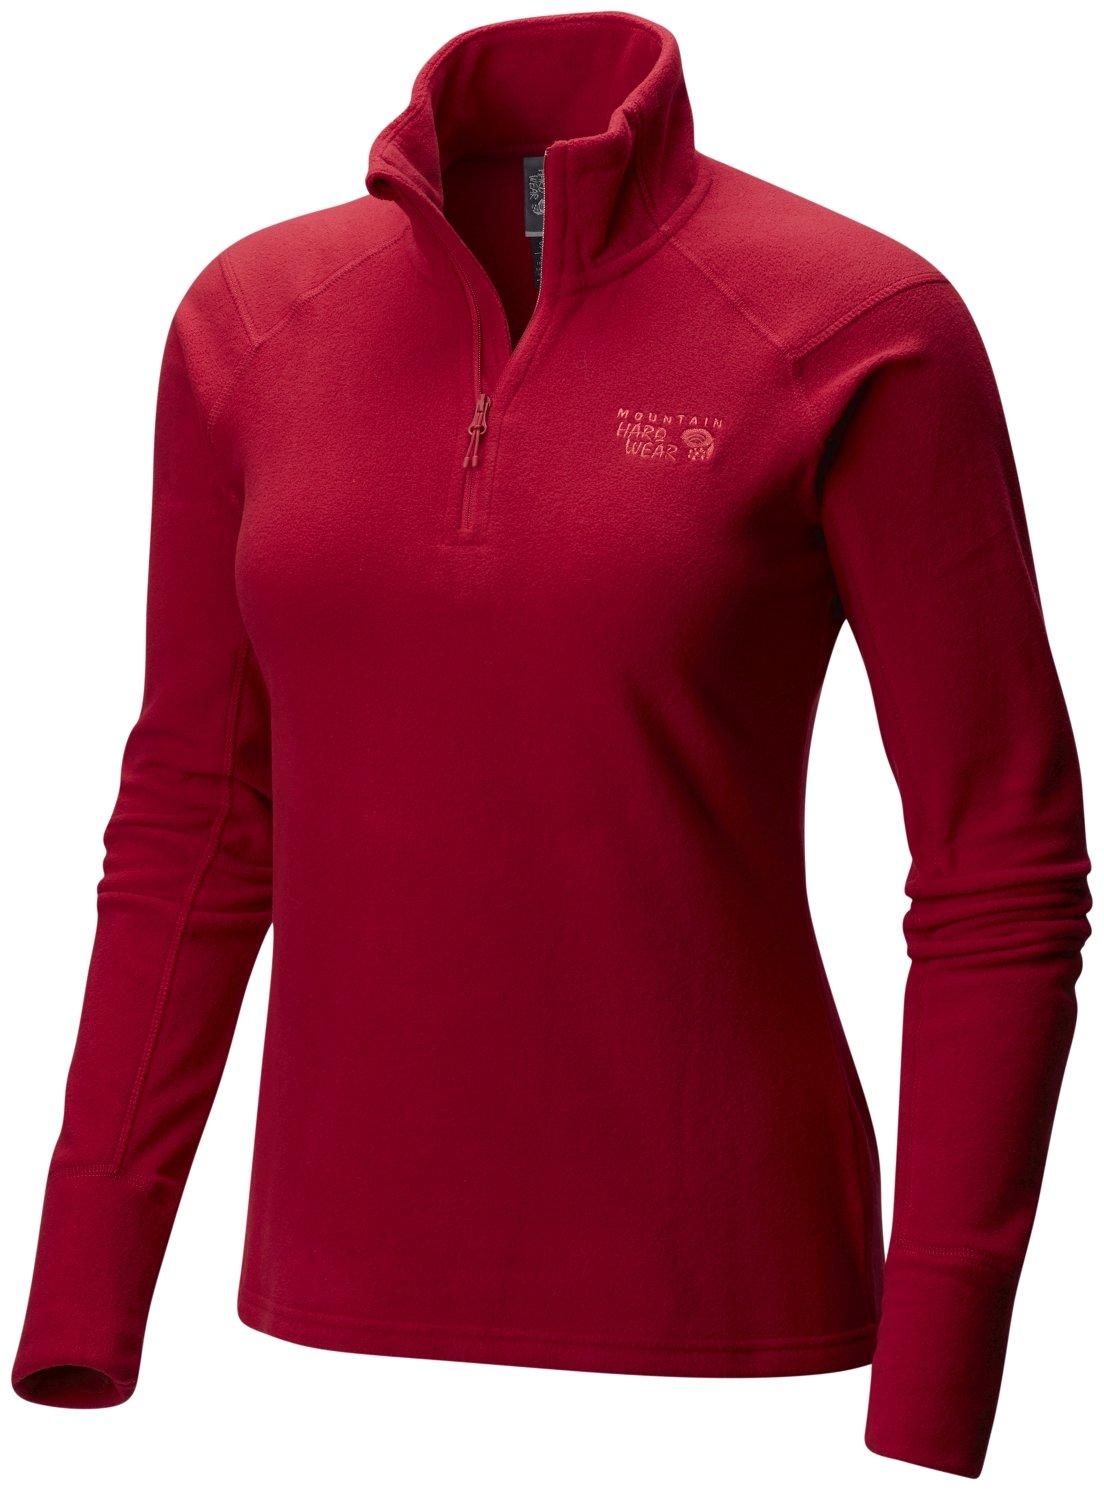 Mountain Hardwear Microchill 2.0 Zip T - Women's Cranstand Small